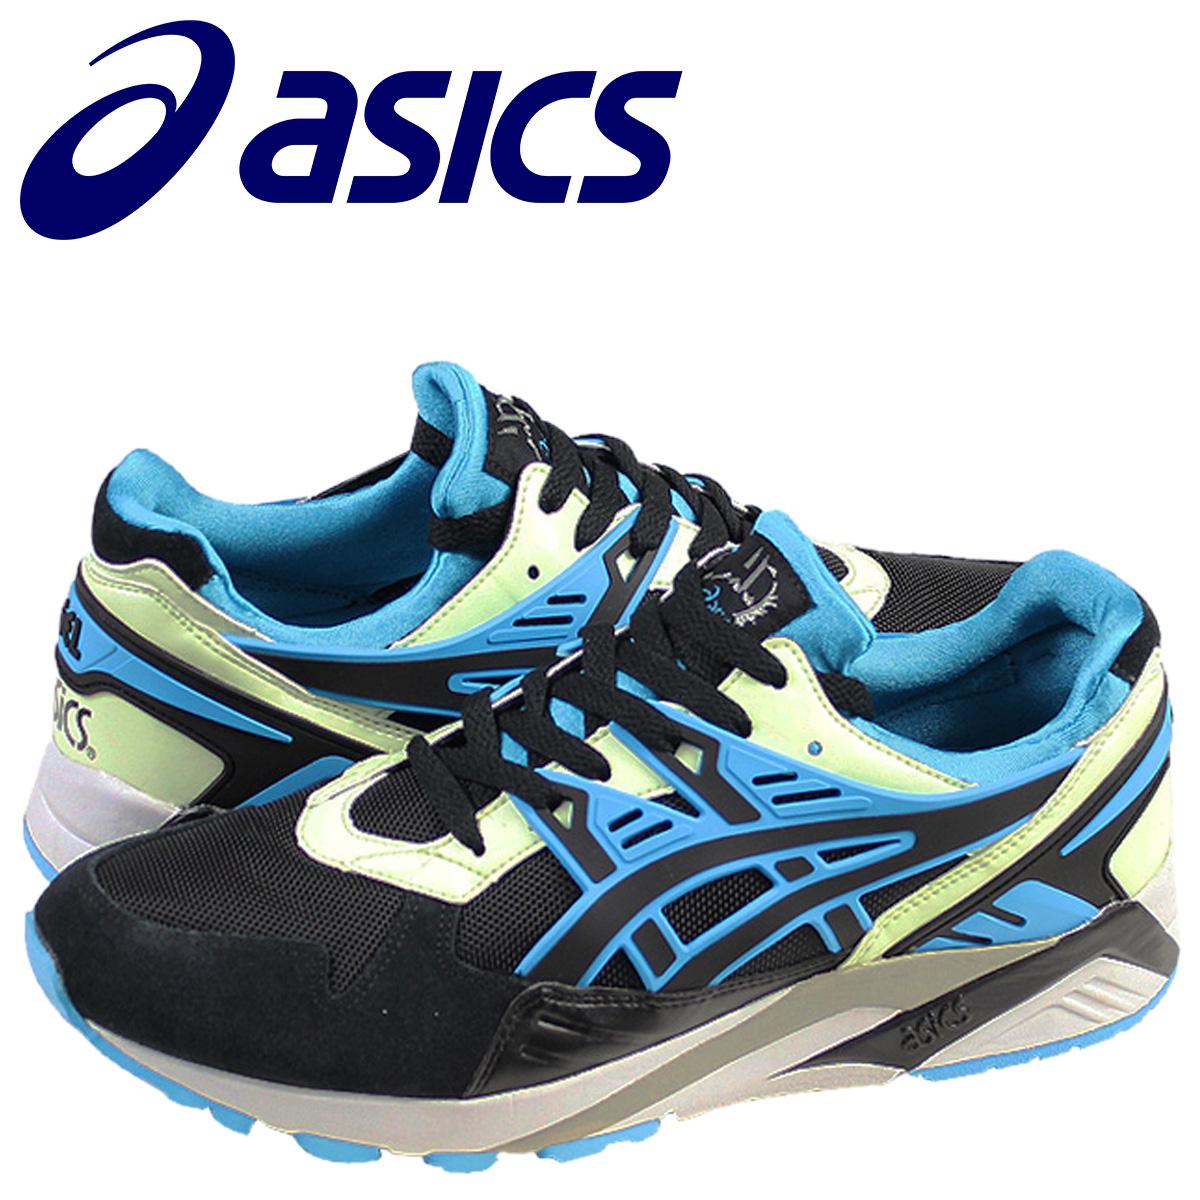 64661ec62b94 ASICS asics GEL-KAYANO sneakers gel Kaya-suede x mesh mens 2014 new TH  442N-9041 black × blue  11   17 new in stock   regular